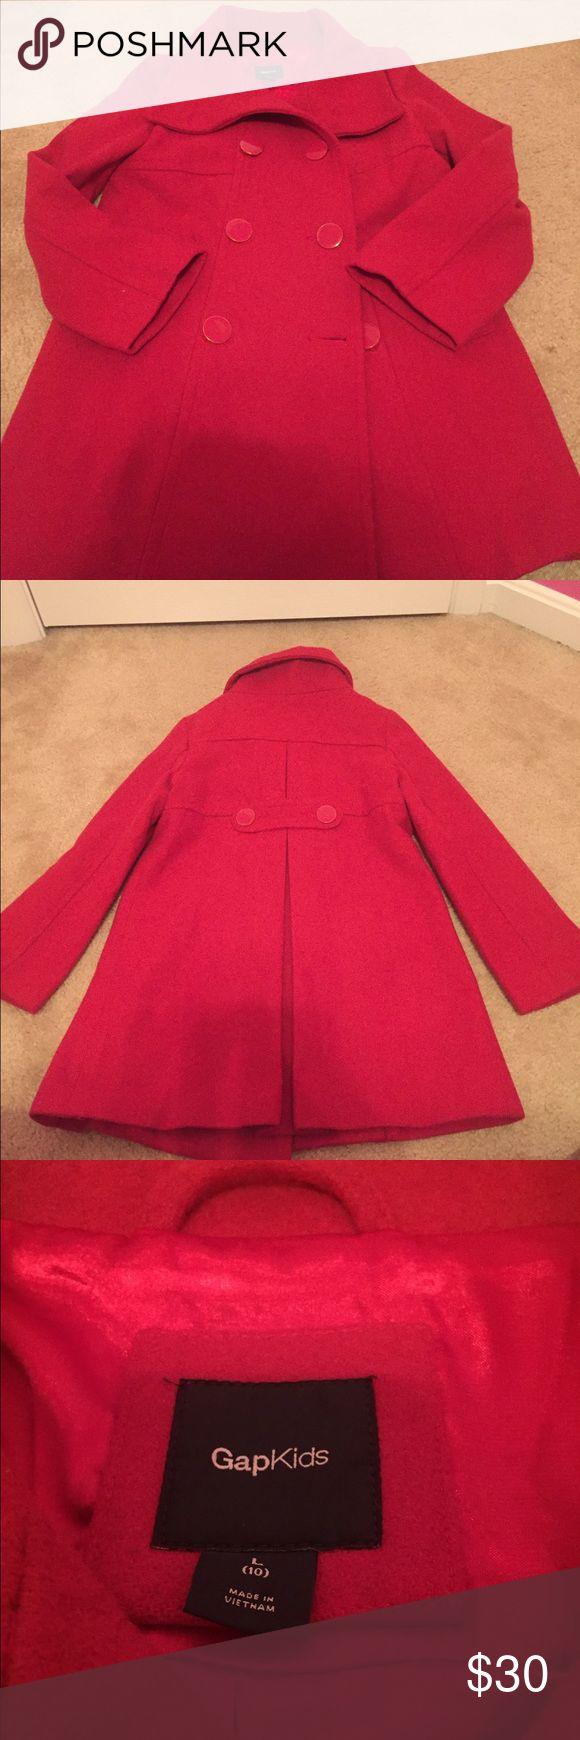 Gap Girls Peacoat Coat worn 2 times in excellent condition... GAP Jackets & Coats Pea Coats